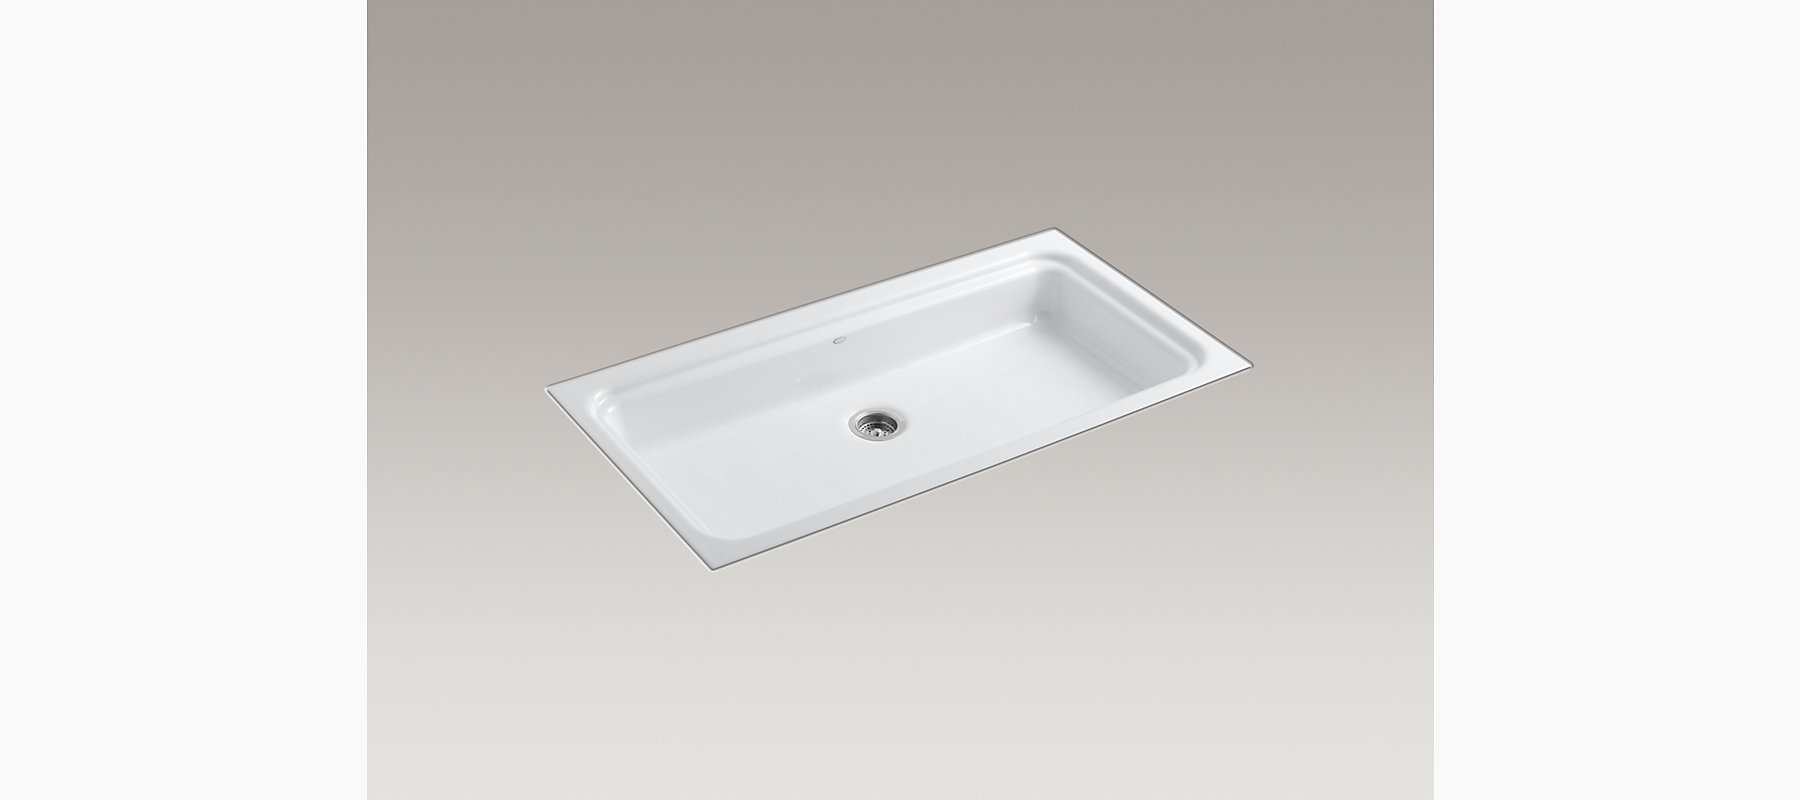 Oceanview Tile-In Utility Sink | K-6606 | KOHLER